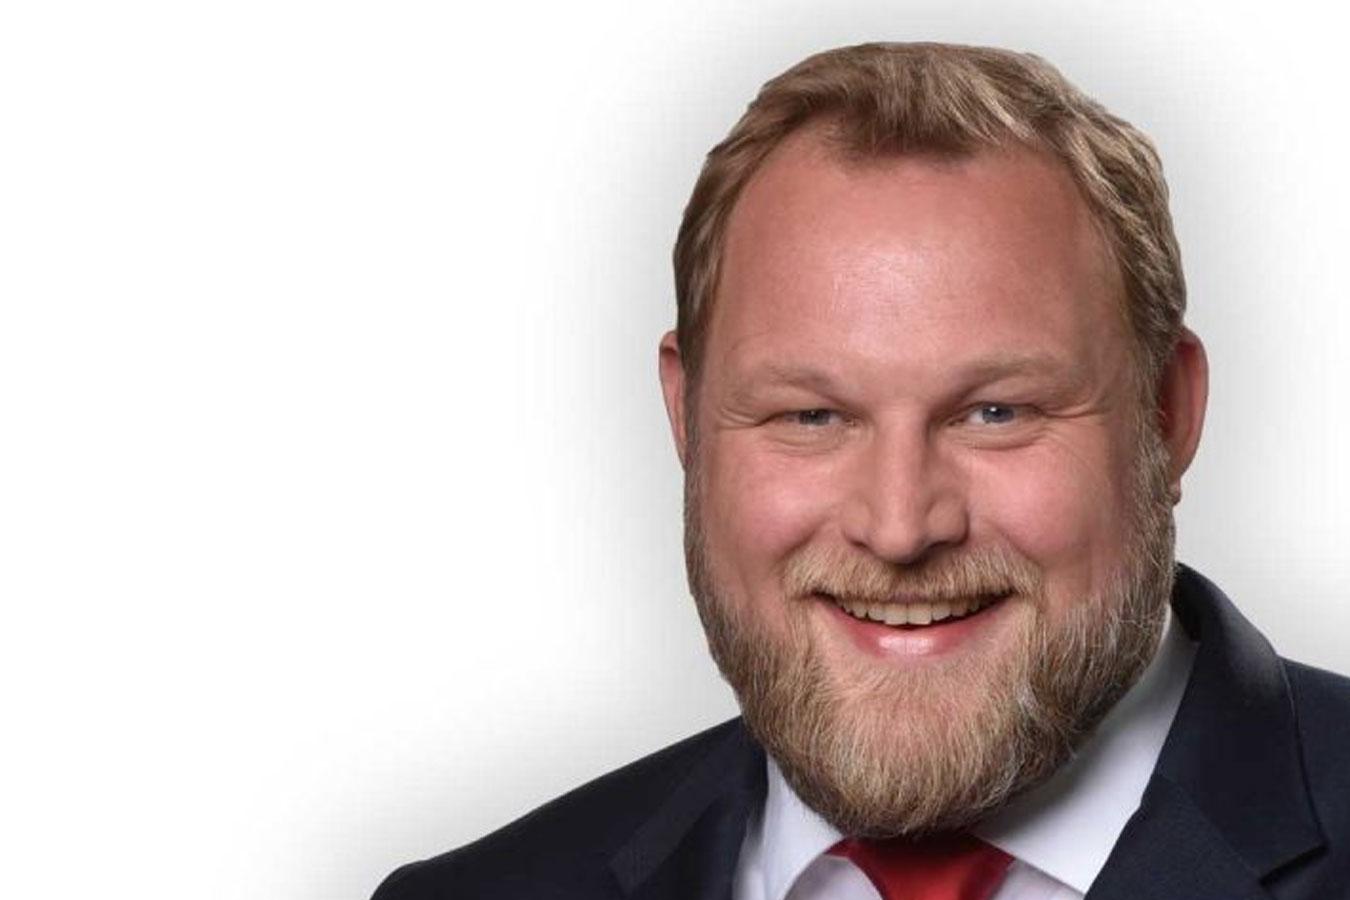 MdL Ulf Prange